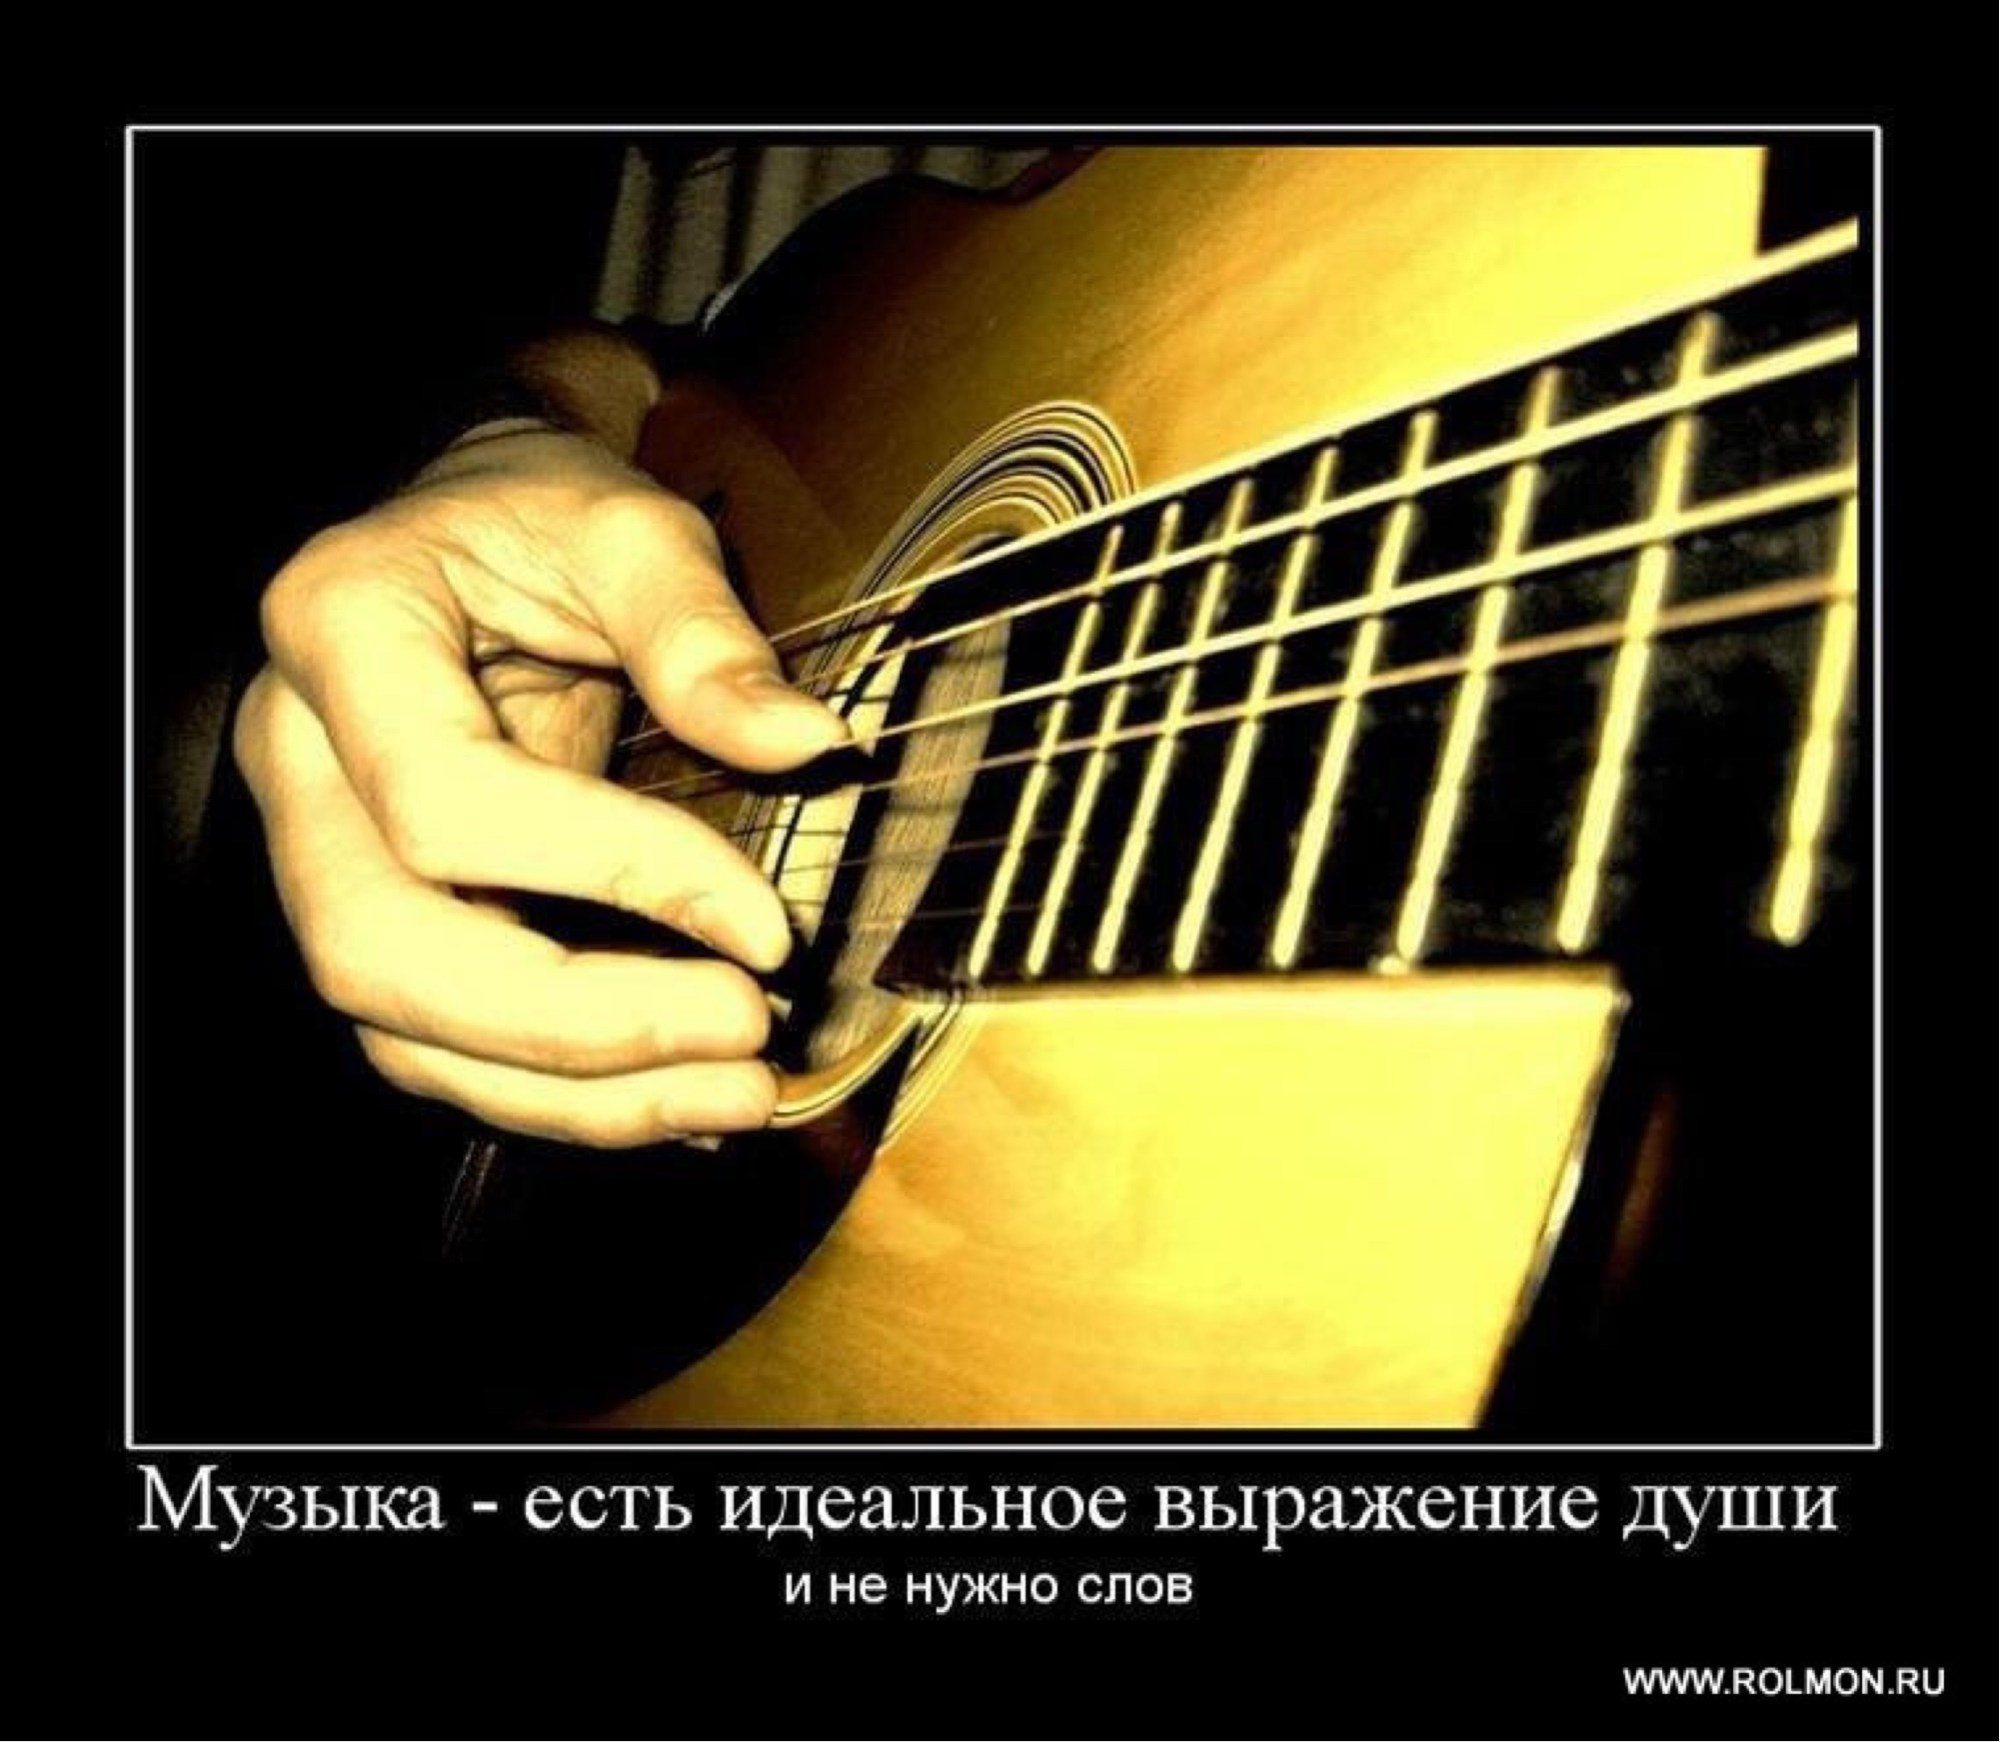 Картинка со словами о музыке